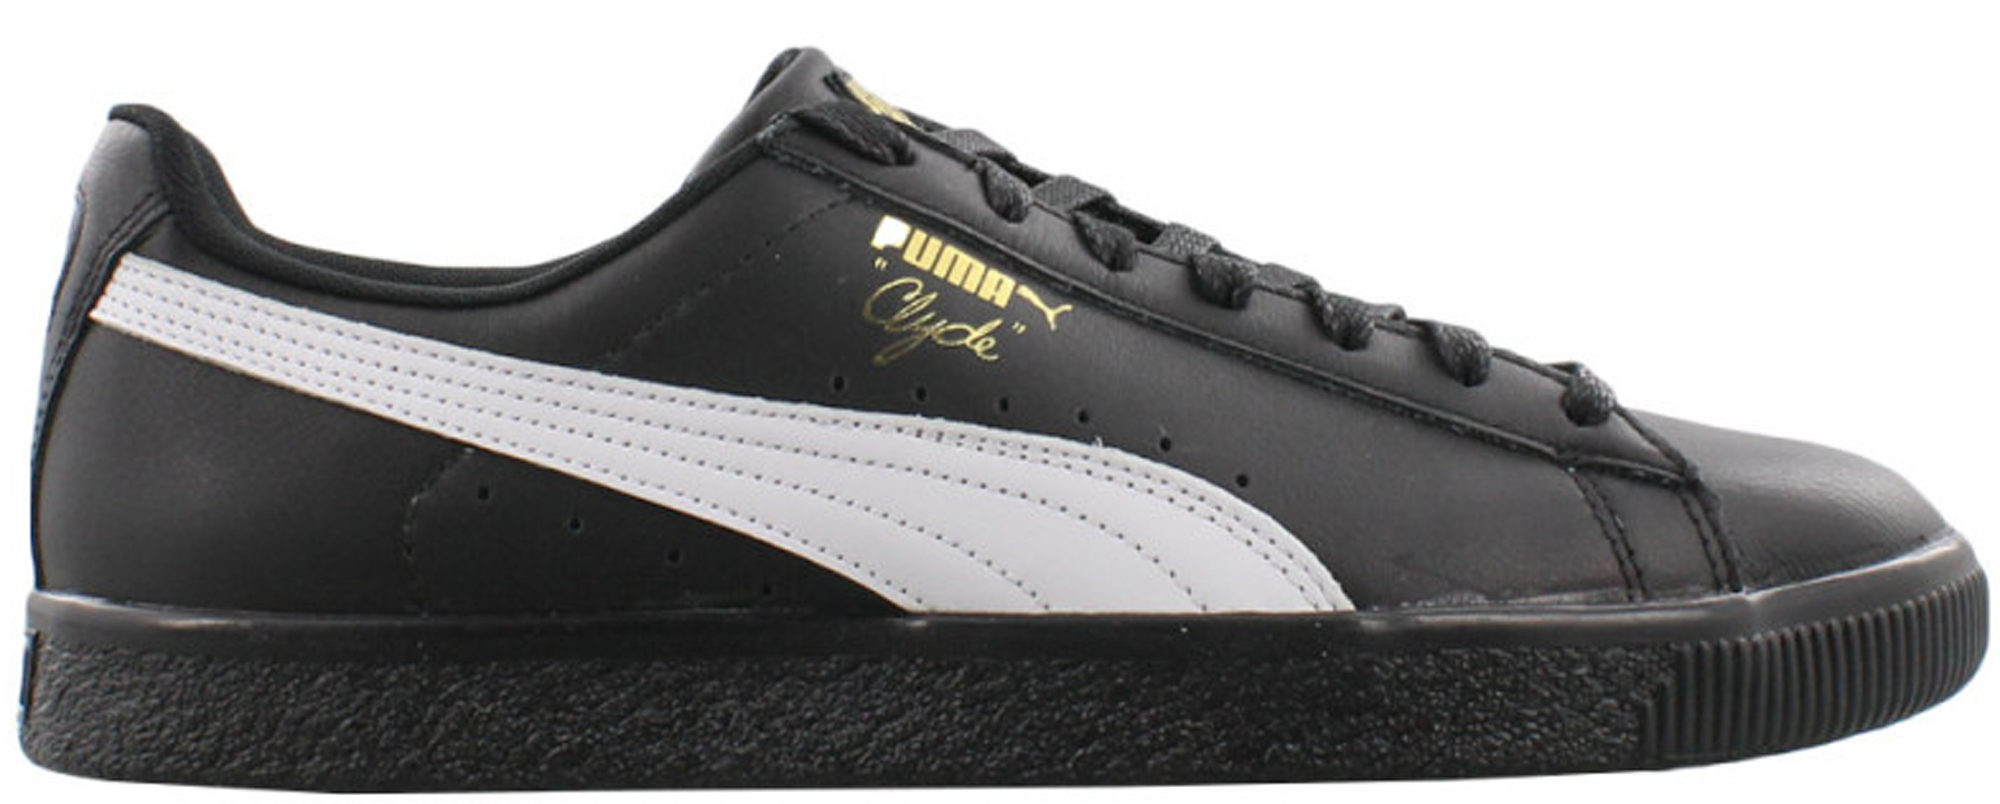 Puma Clyde Core Foil Black White